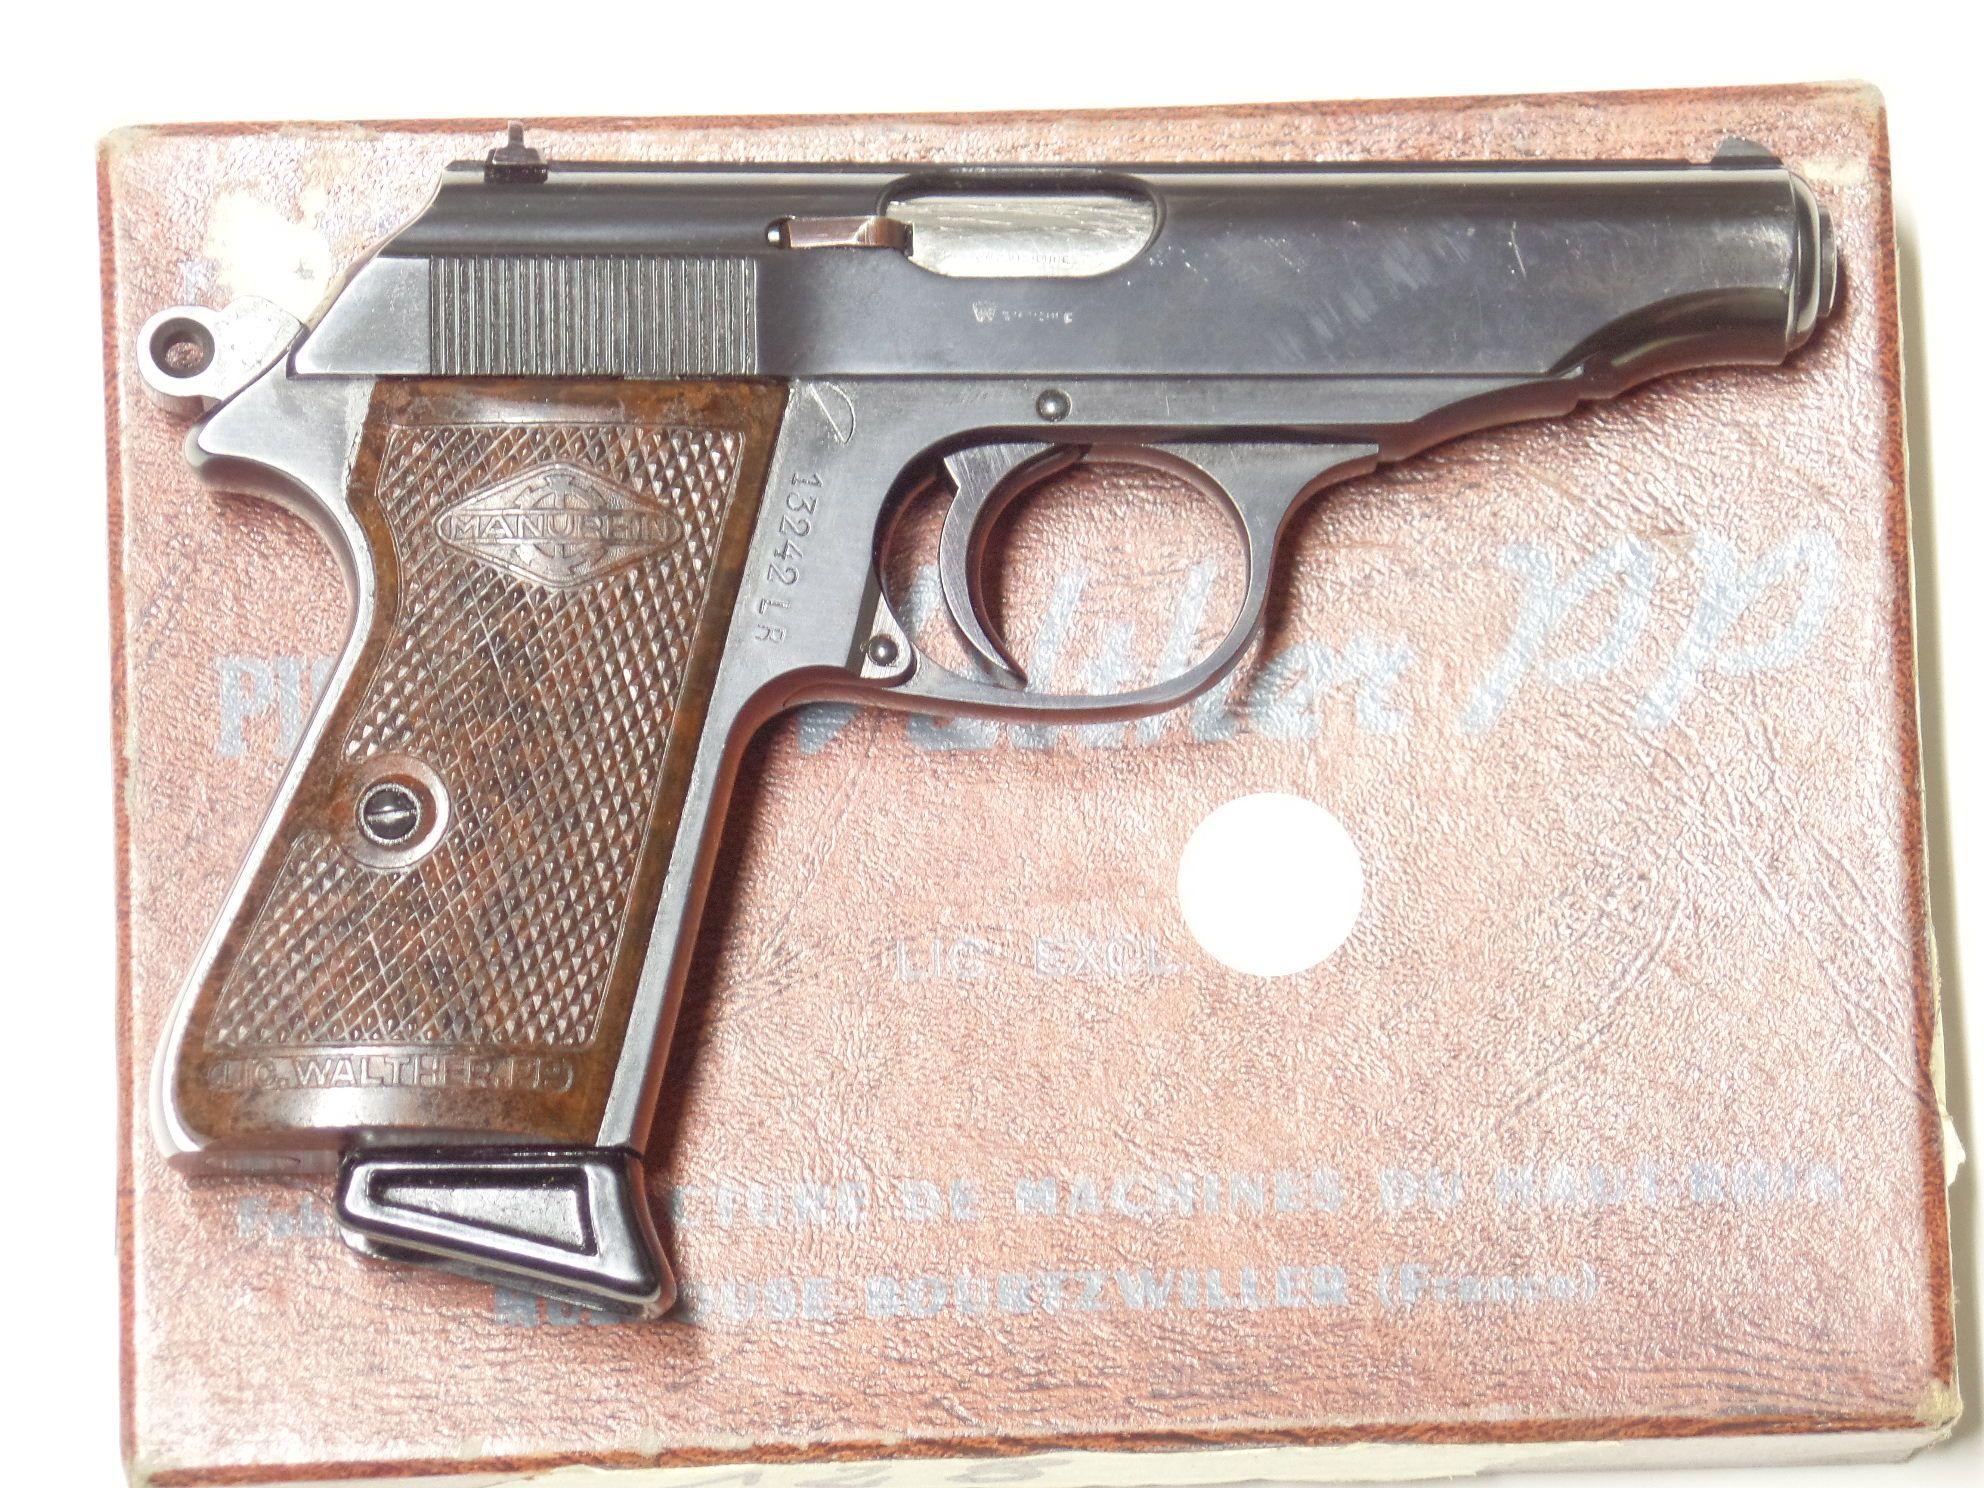 WALTHER MANURHIN PP calibre 22LR